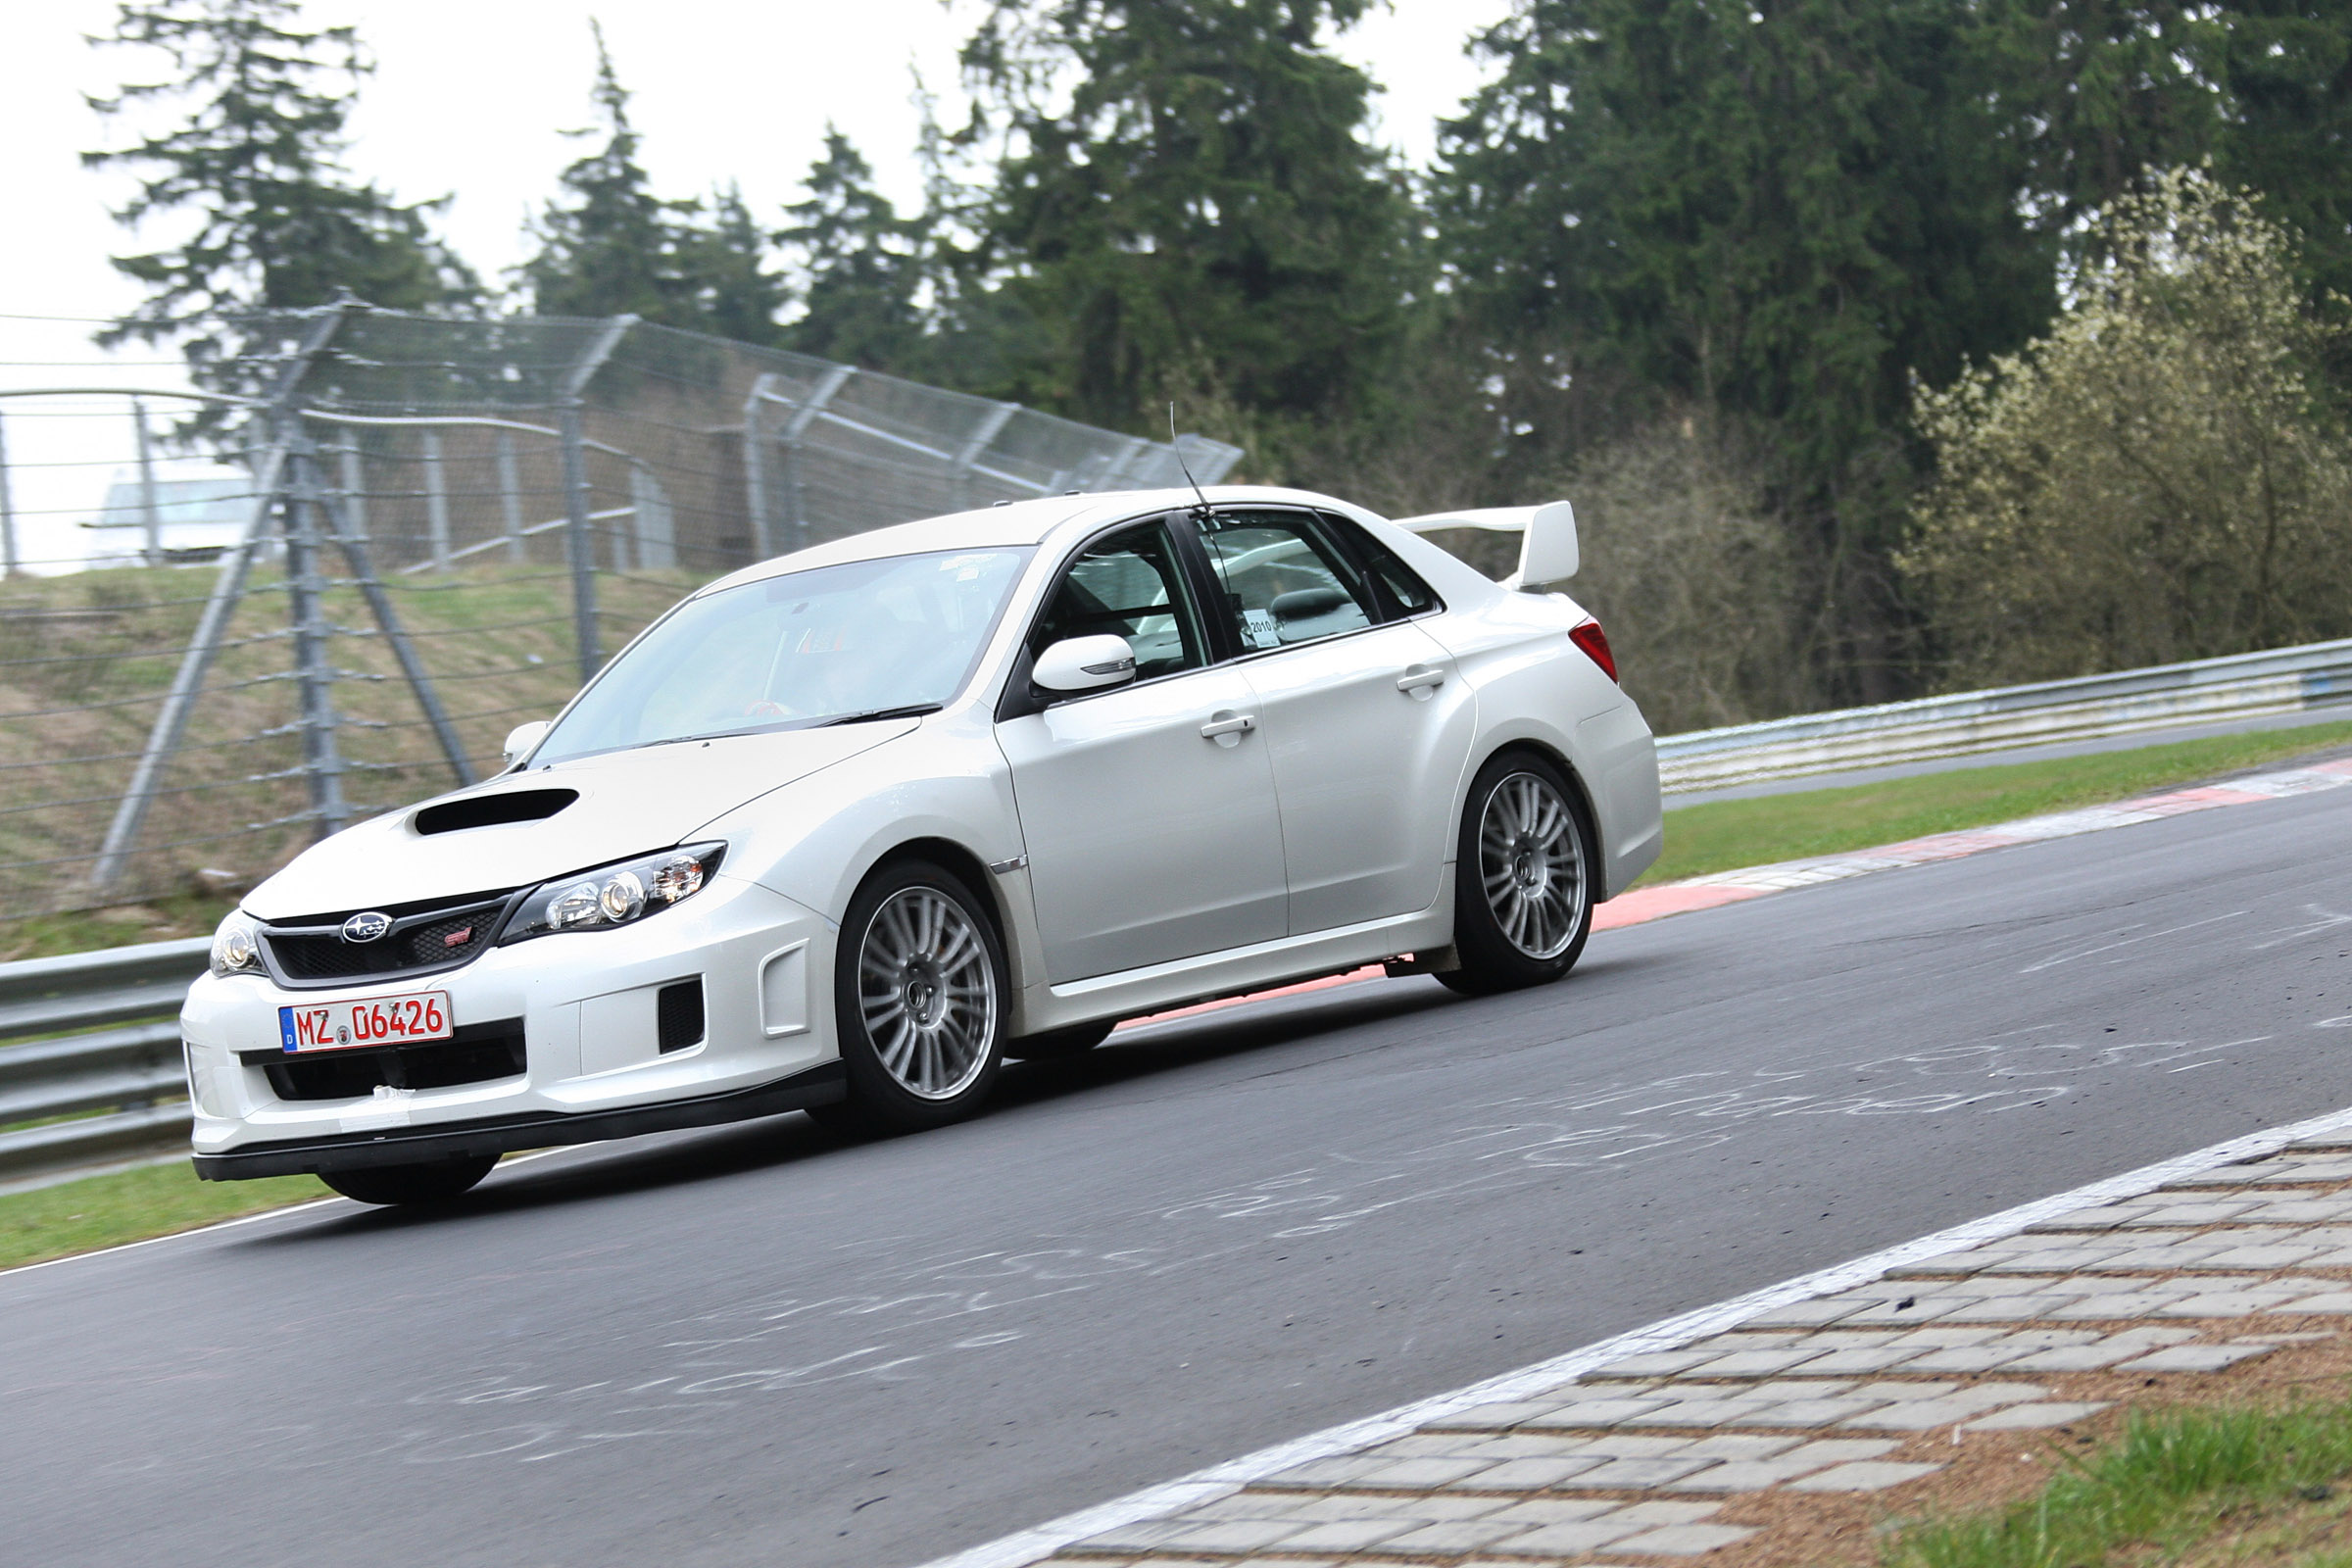 2011 Subaru Wrx Sti 4 Door At Nurburgring Picture 38353